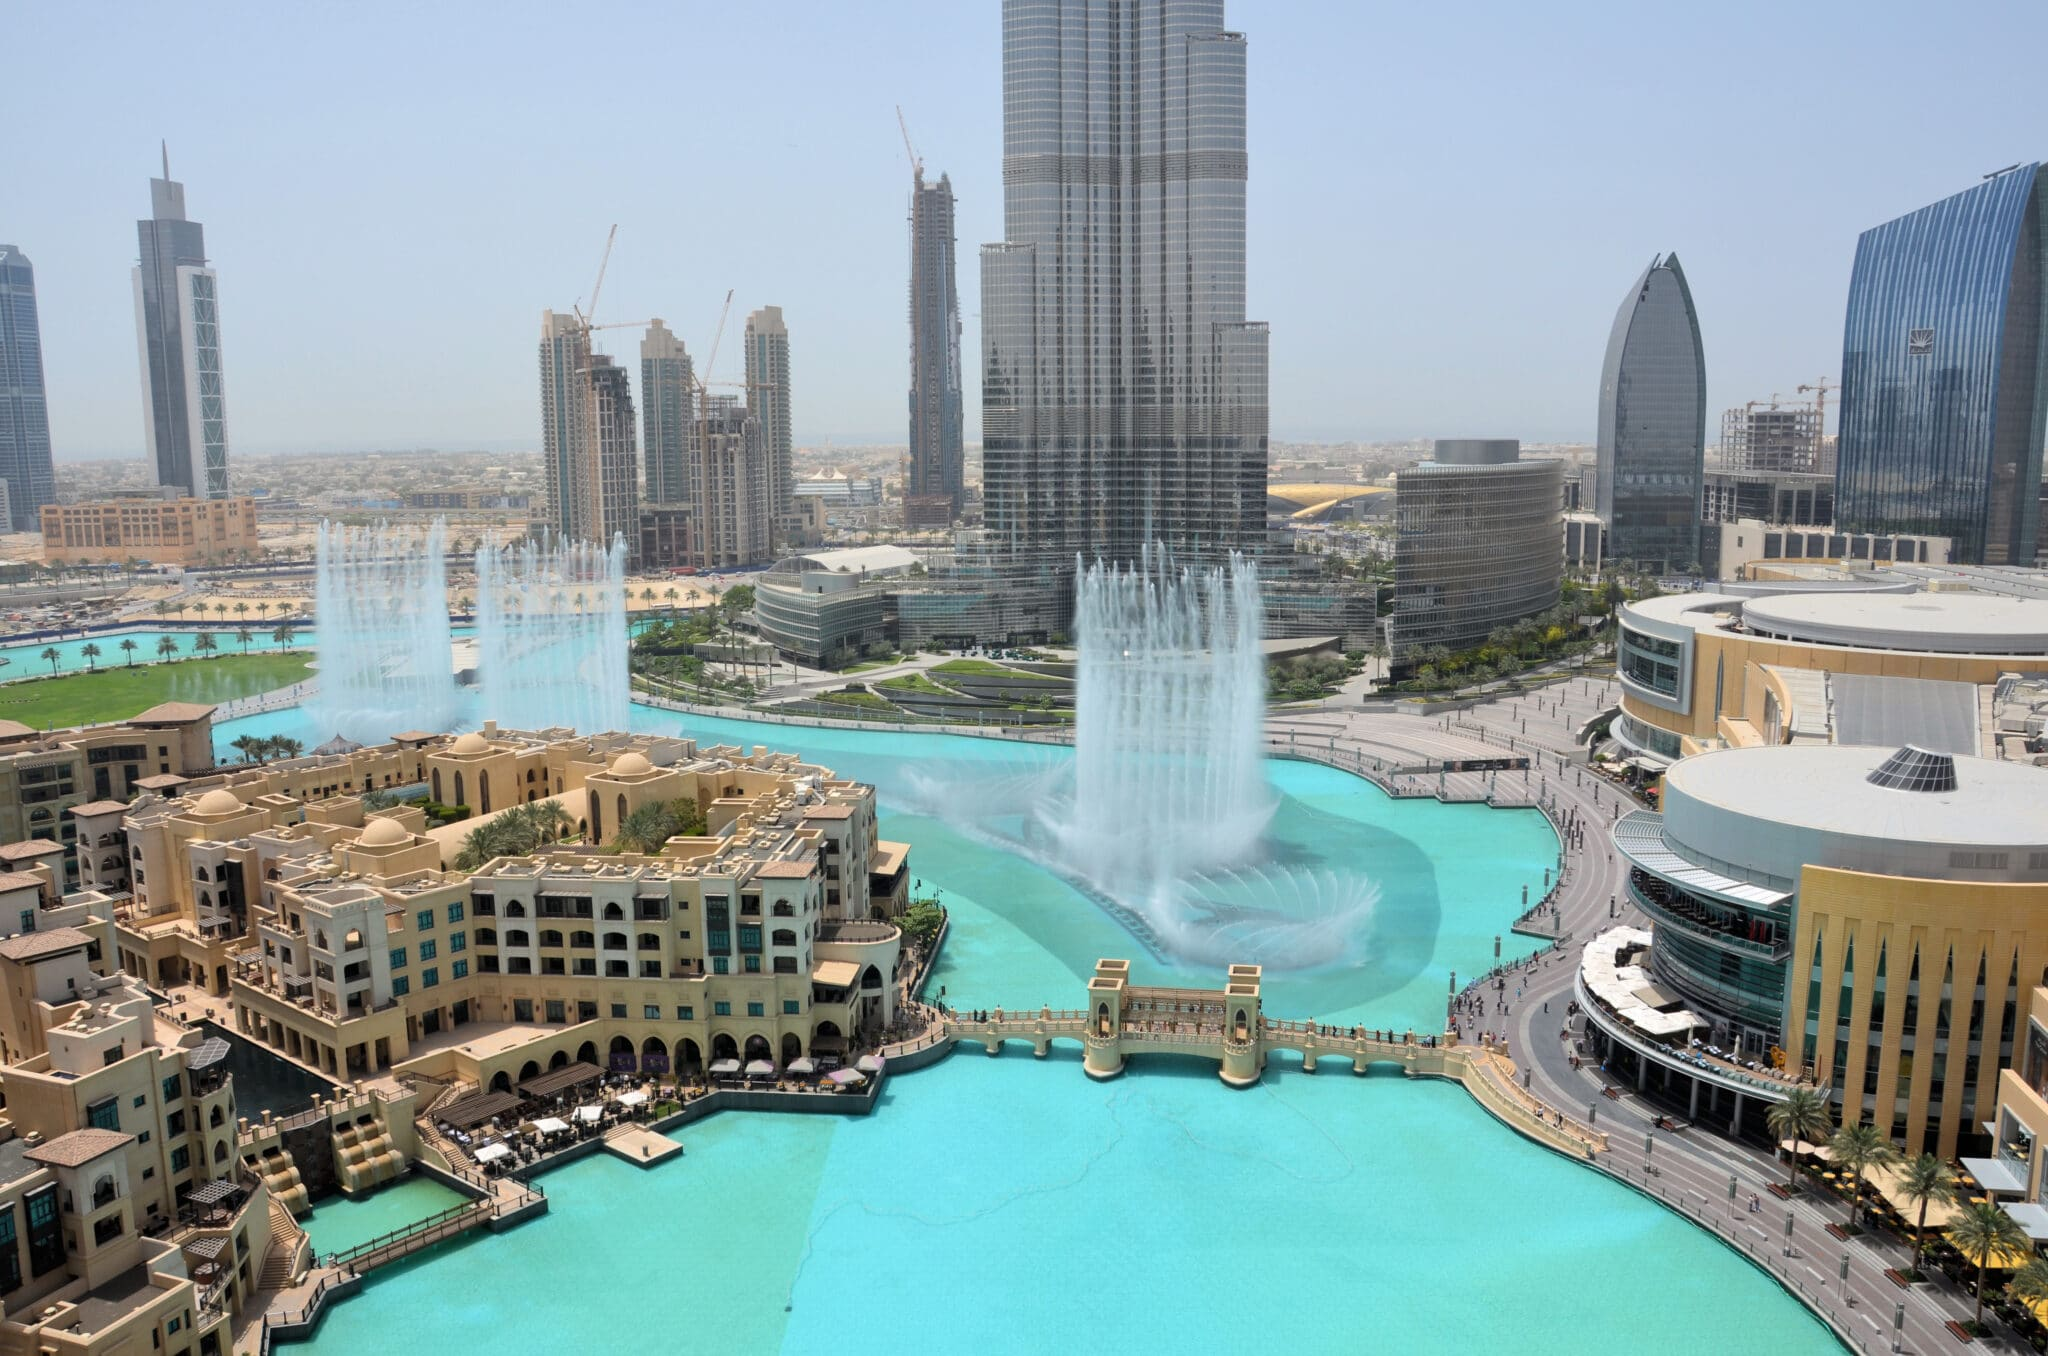 familieoplevelser-i-Dubai - AdobeStock_43177401.jpeg